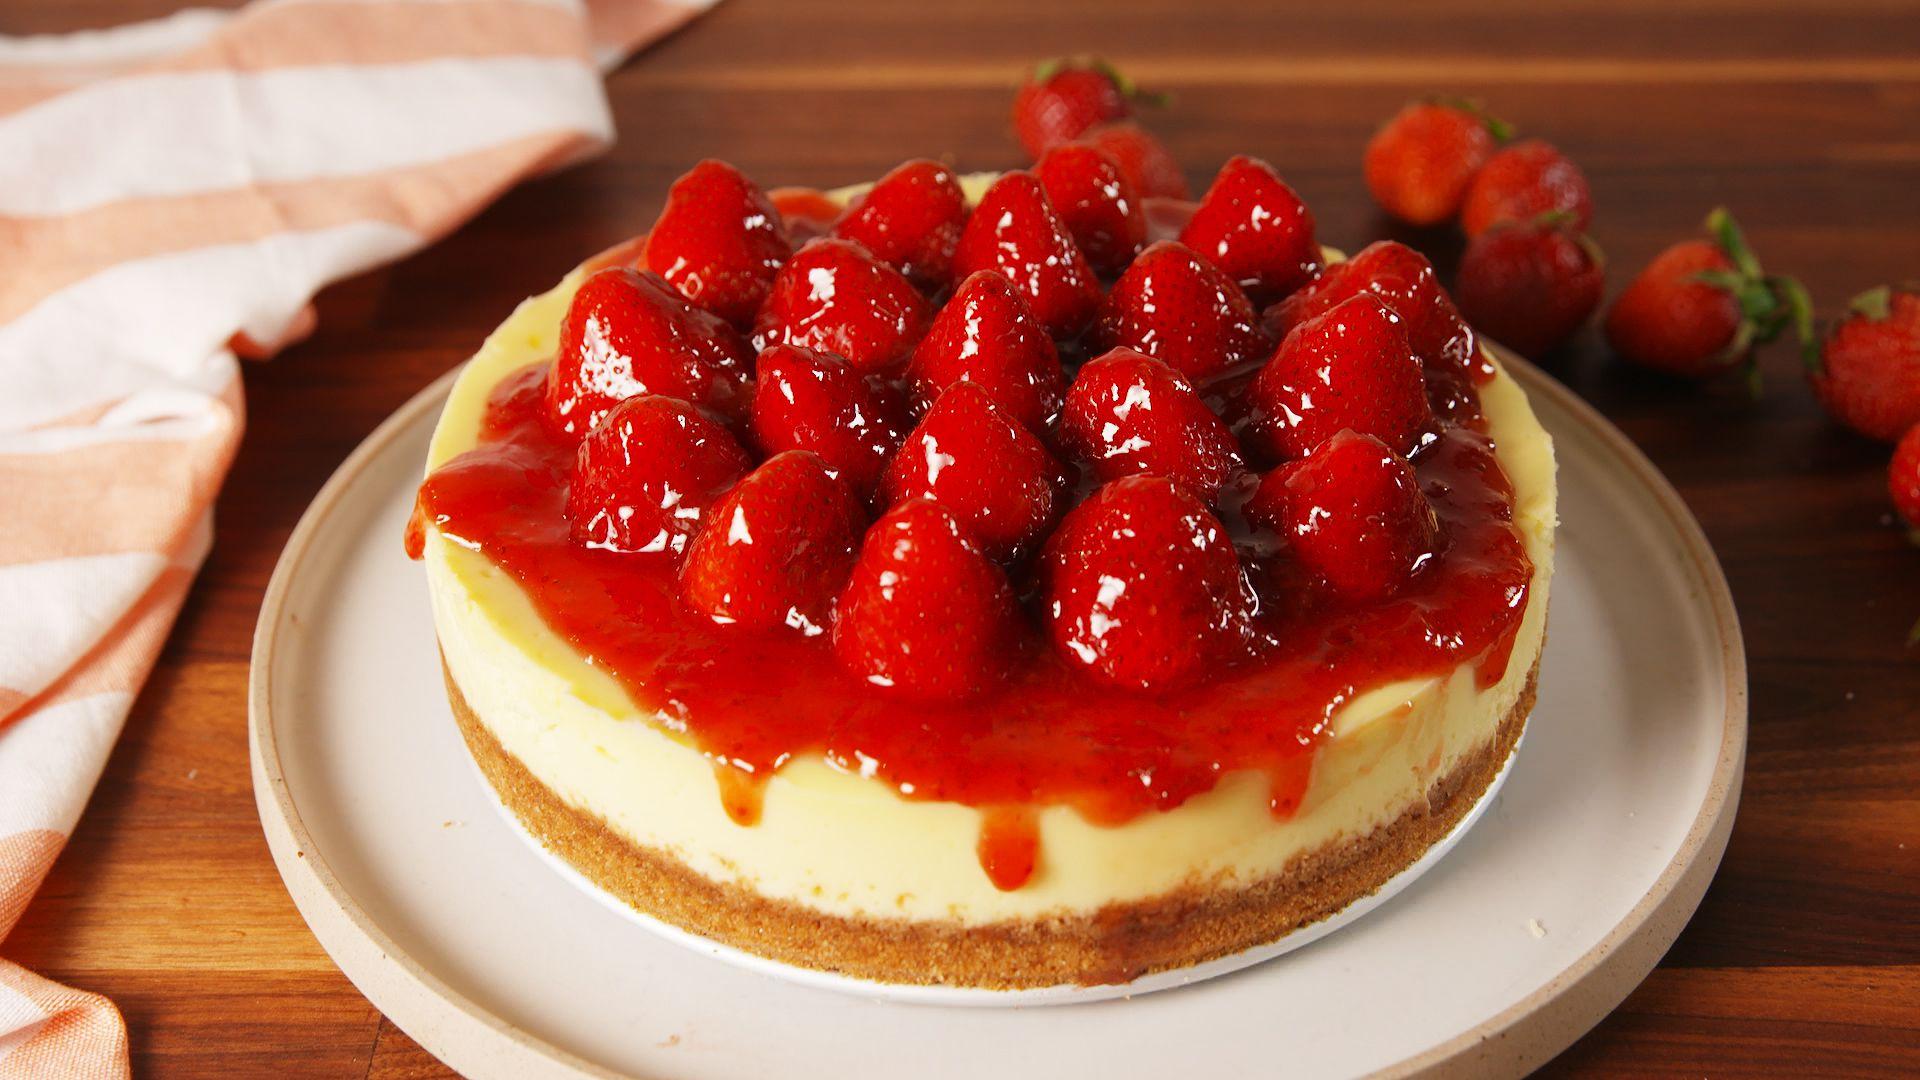 Best Strawberry Cheesecake Recipe - How to Make Strawberry Cheesecake